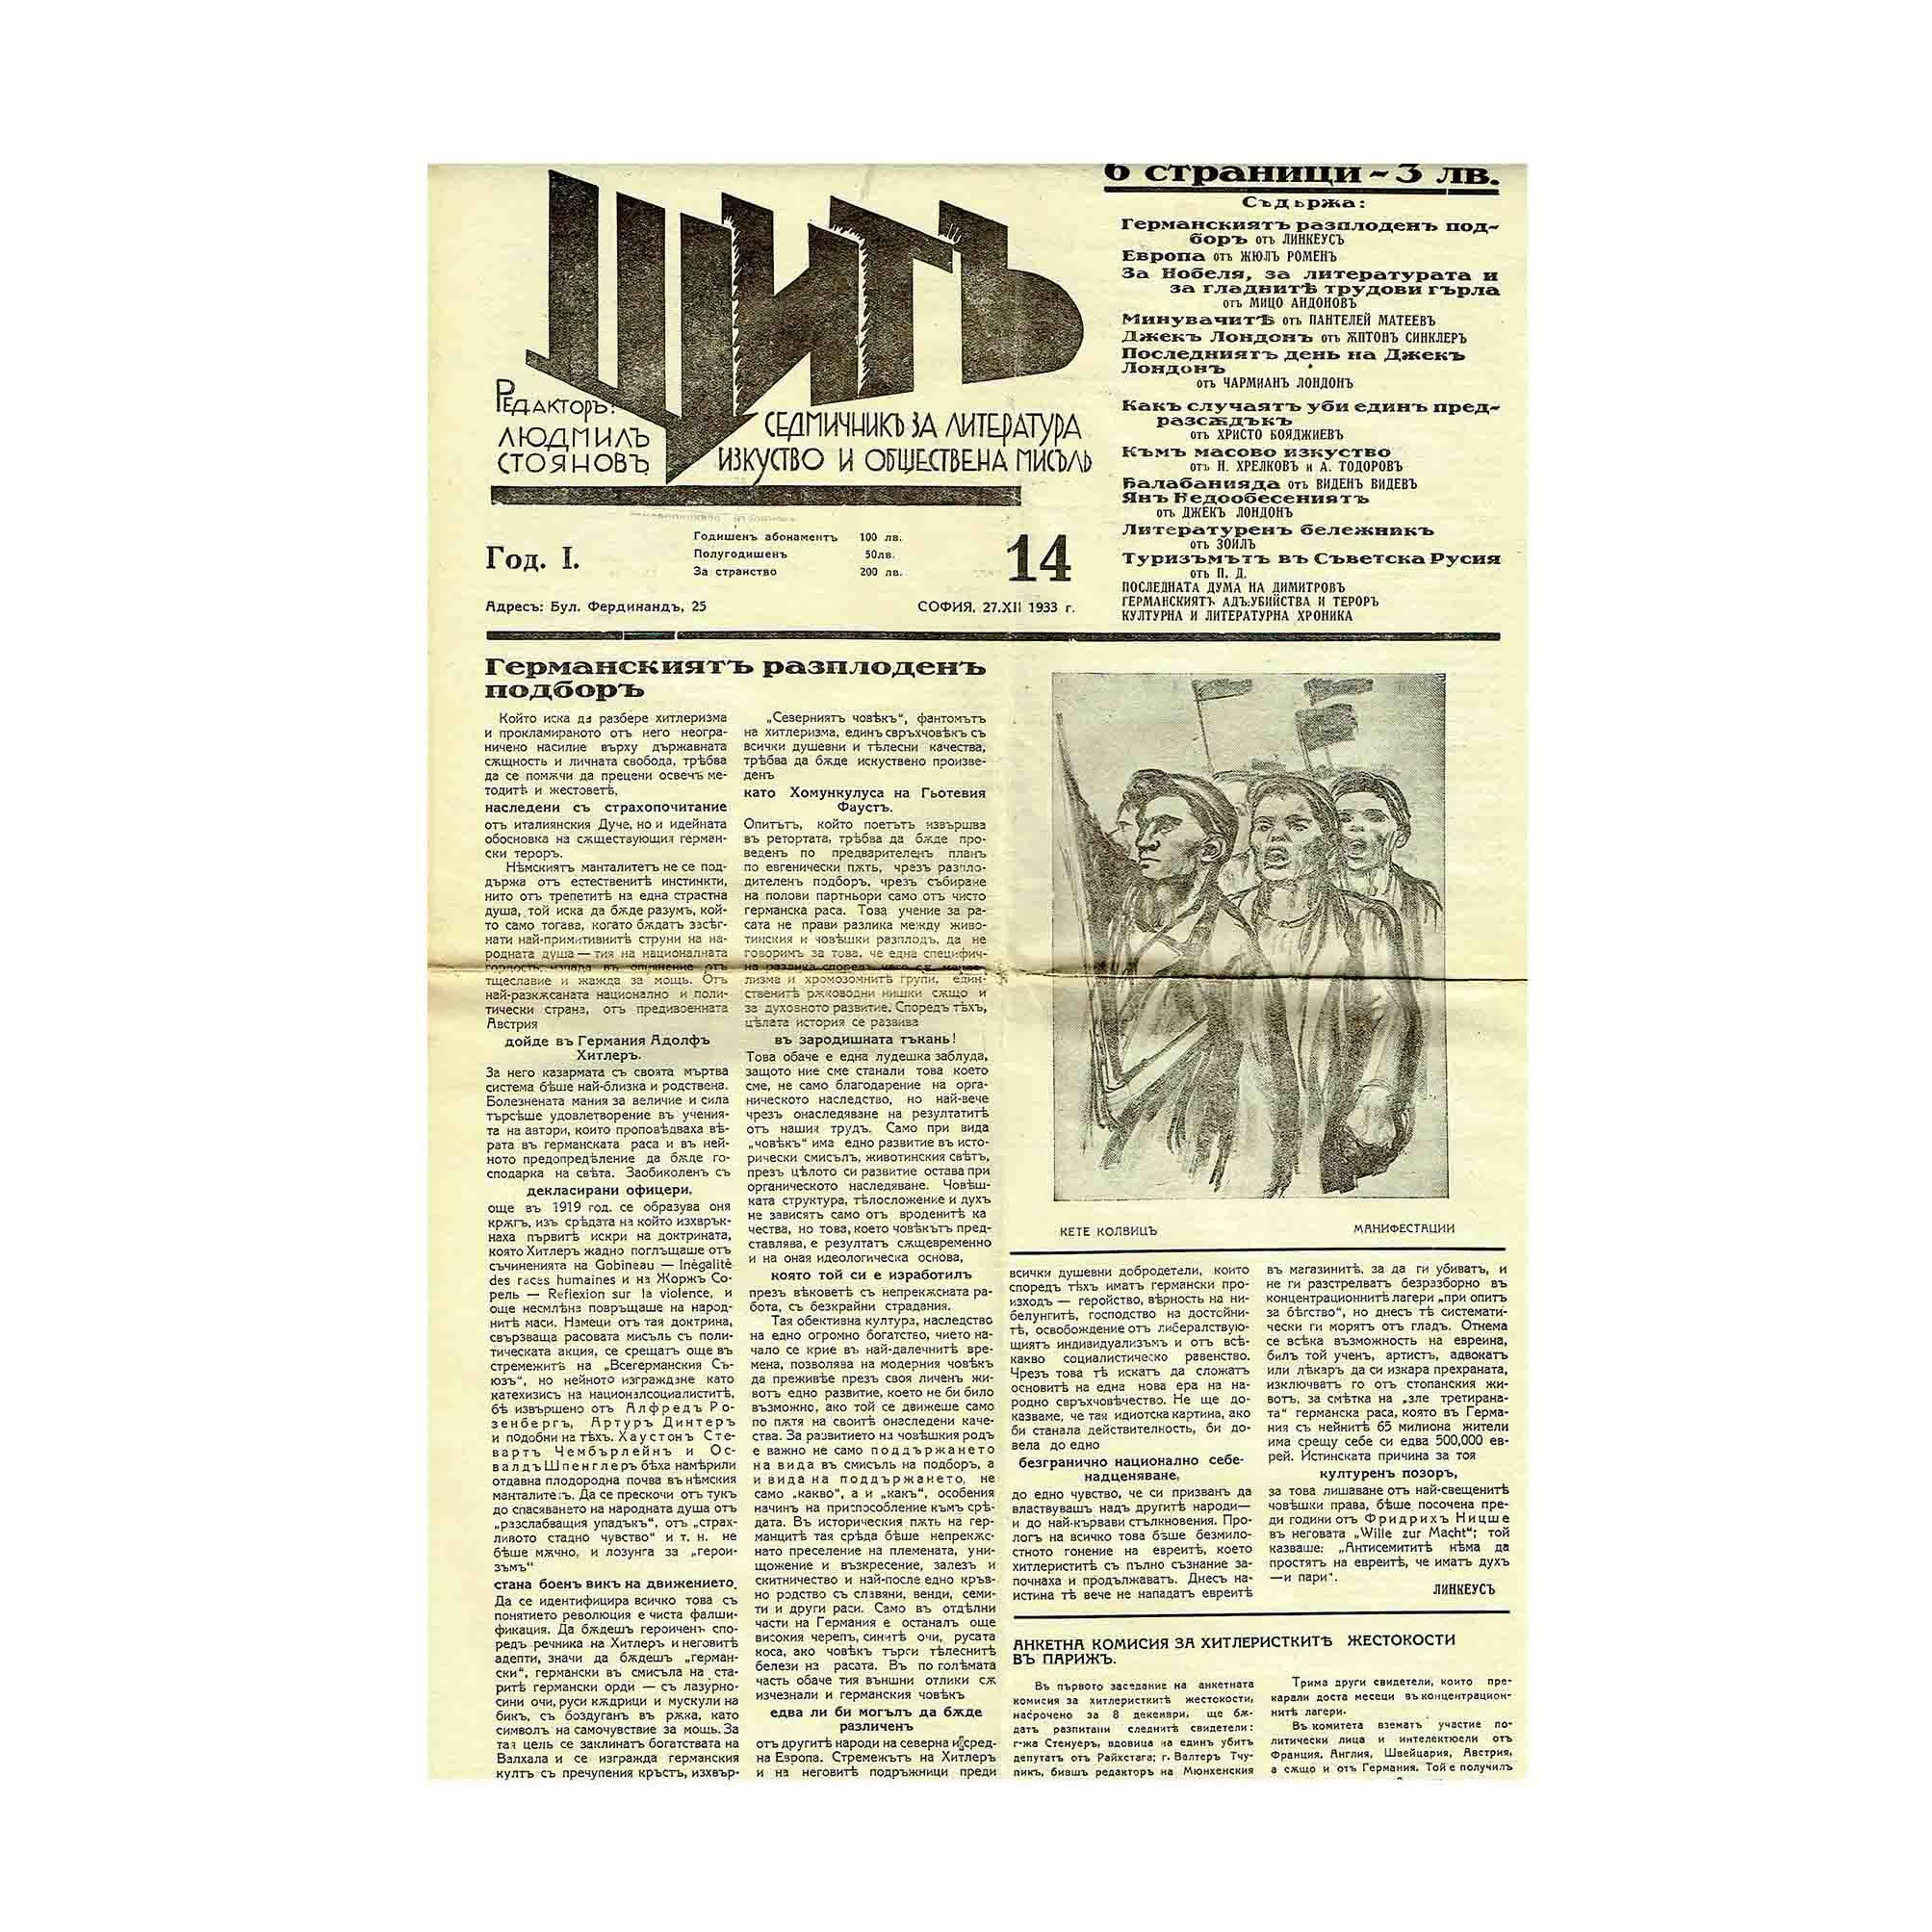 6033 Shtit I 14 Titelblatt N